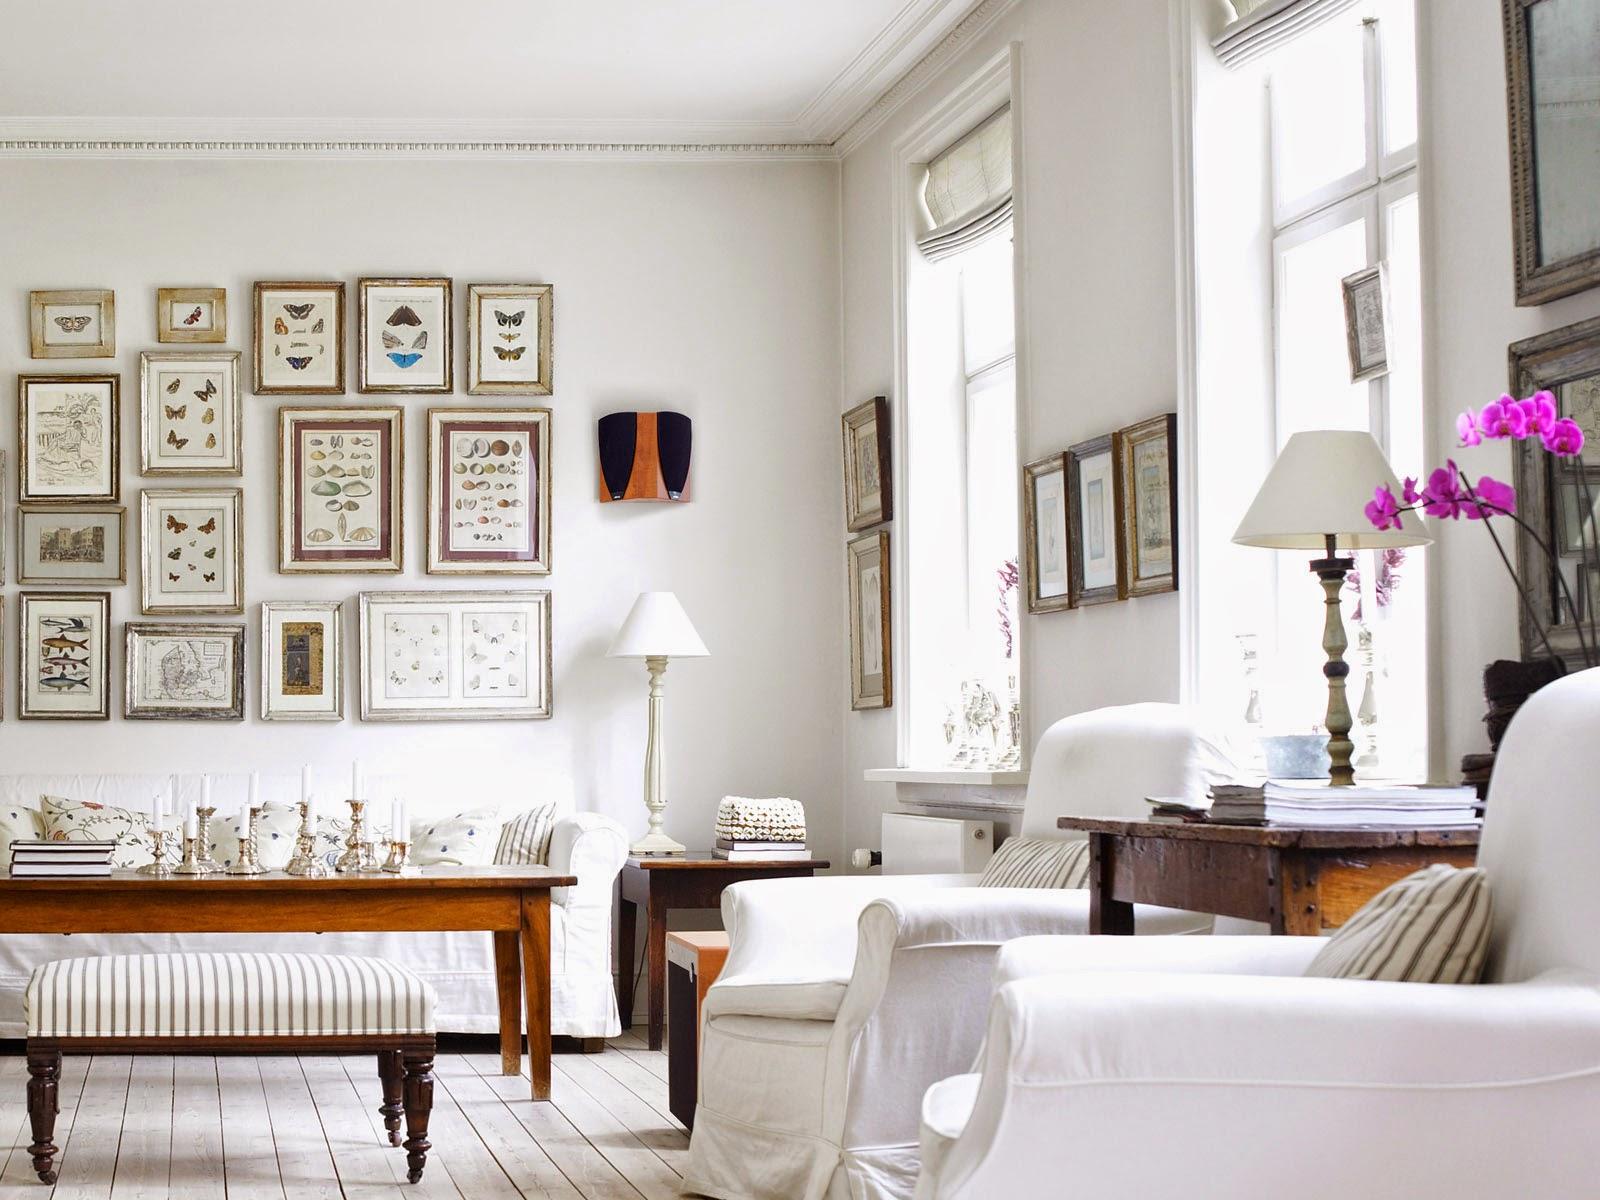 Dekorasi Rumah Mungil Sederhana